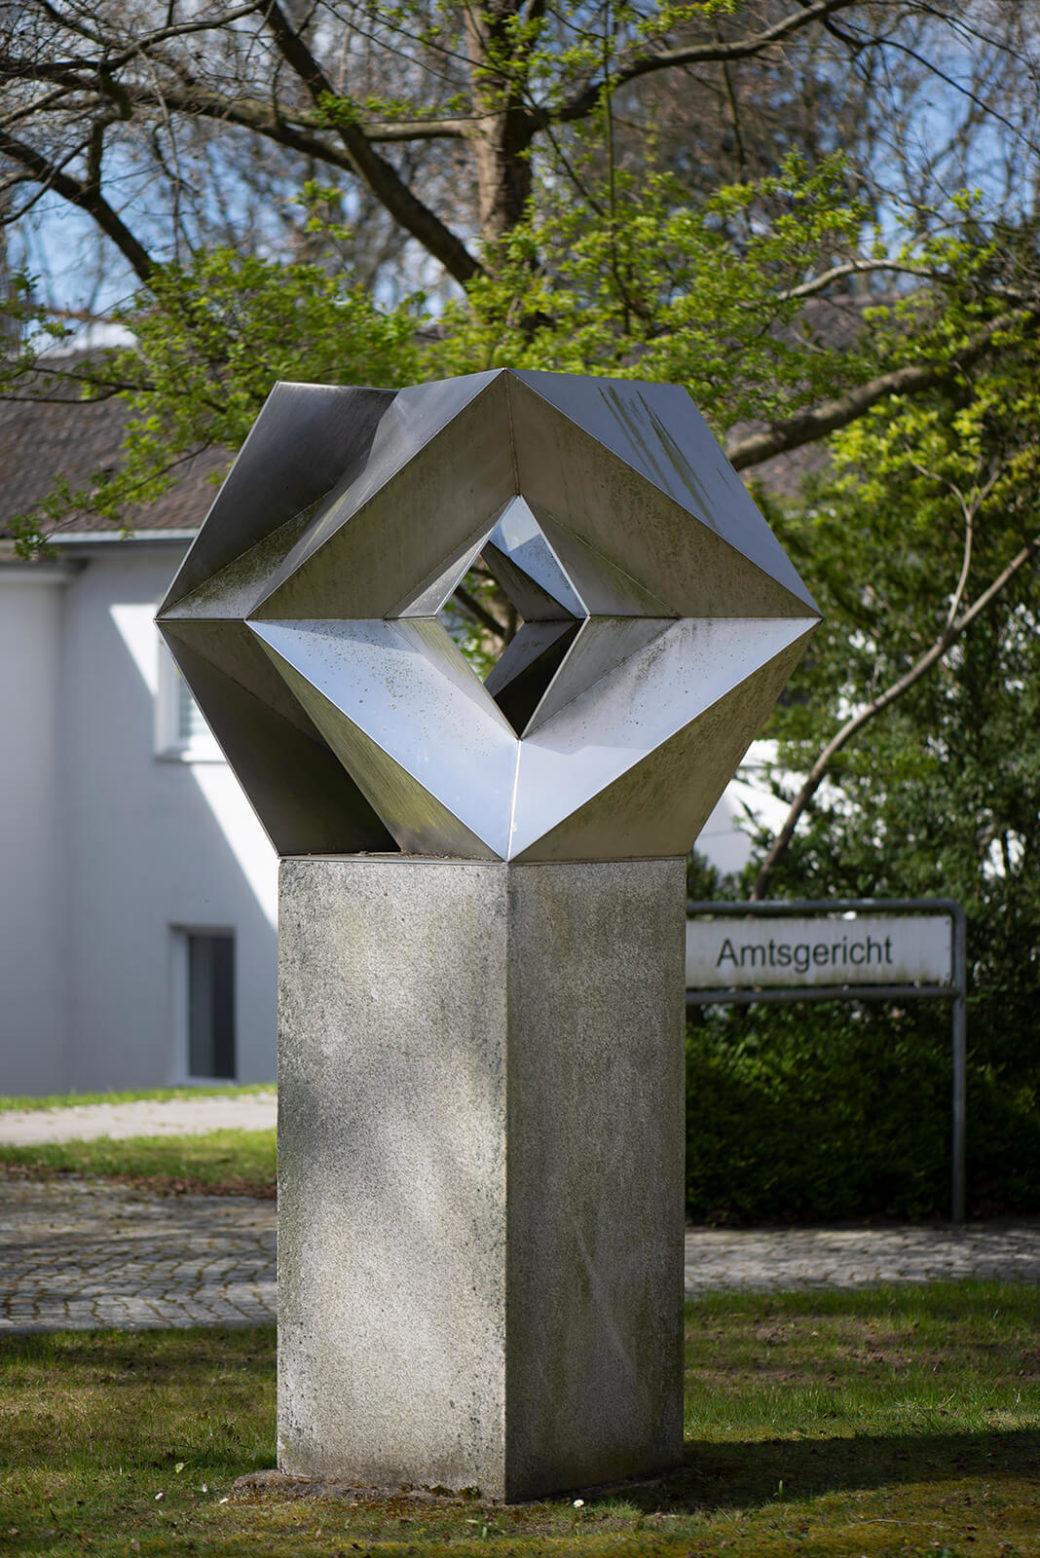 Günter Wiese: Große Zieltafel (Foto: KUNST@SH/Jan Petersen, 2020)